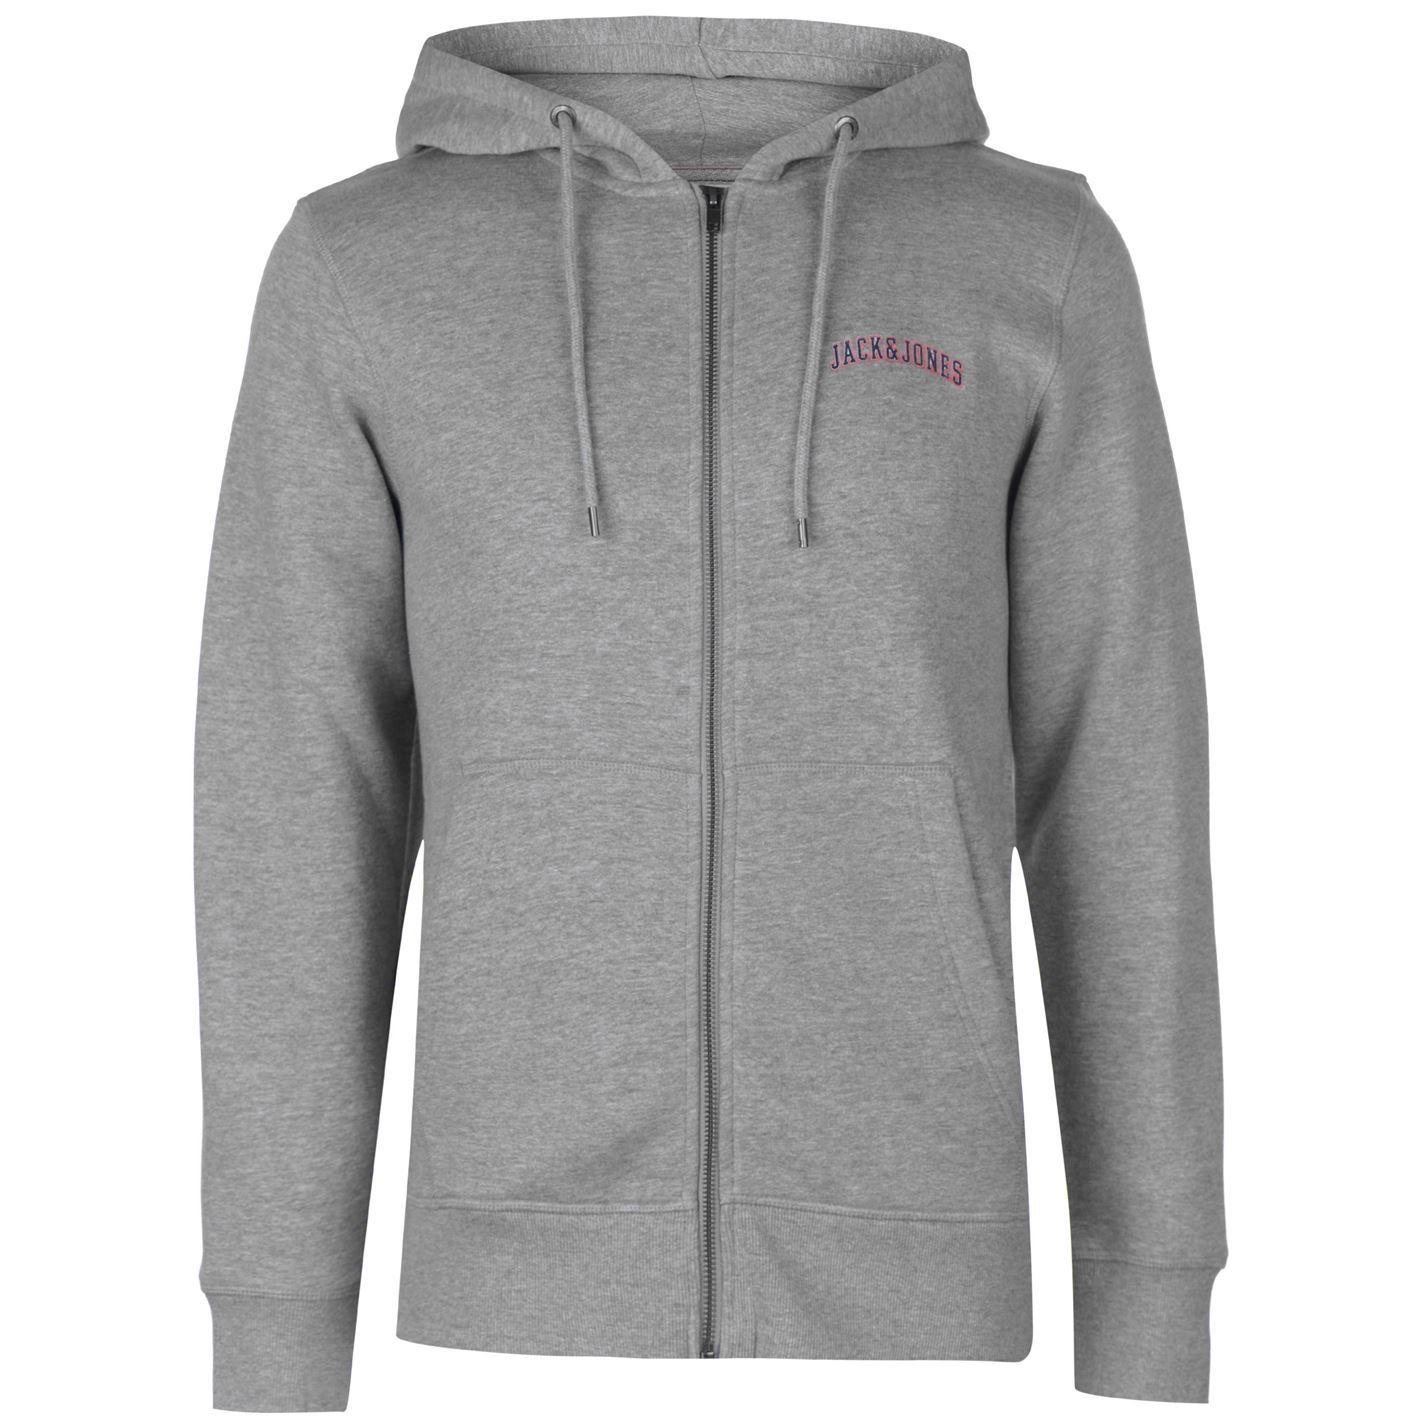 Jack-and-Jones-Originals-Harvey-Zip-Hoodie-Mens-Hooded-Top-Sweater-Outerwear thumbnail 6